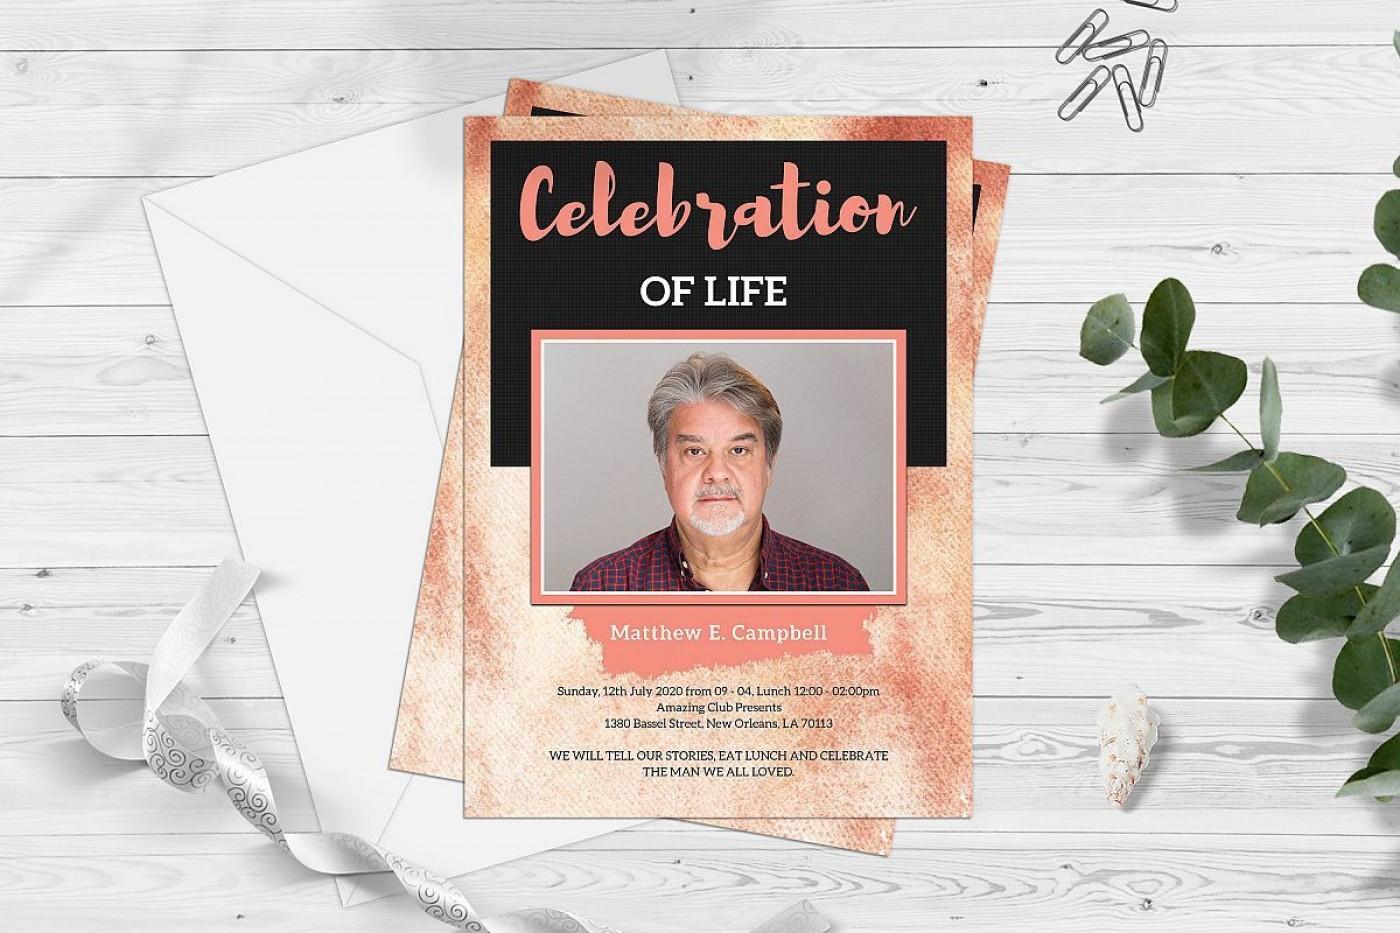 002 Surprising Celebration Of Life Invitation Template Free Image 1400